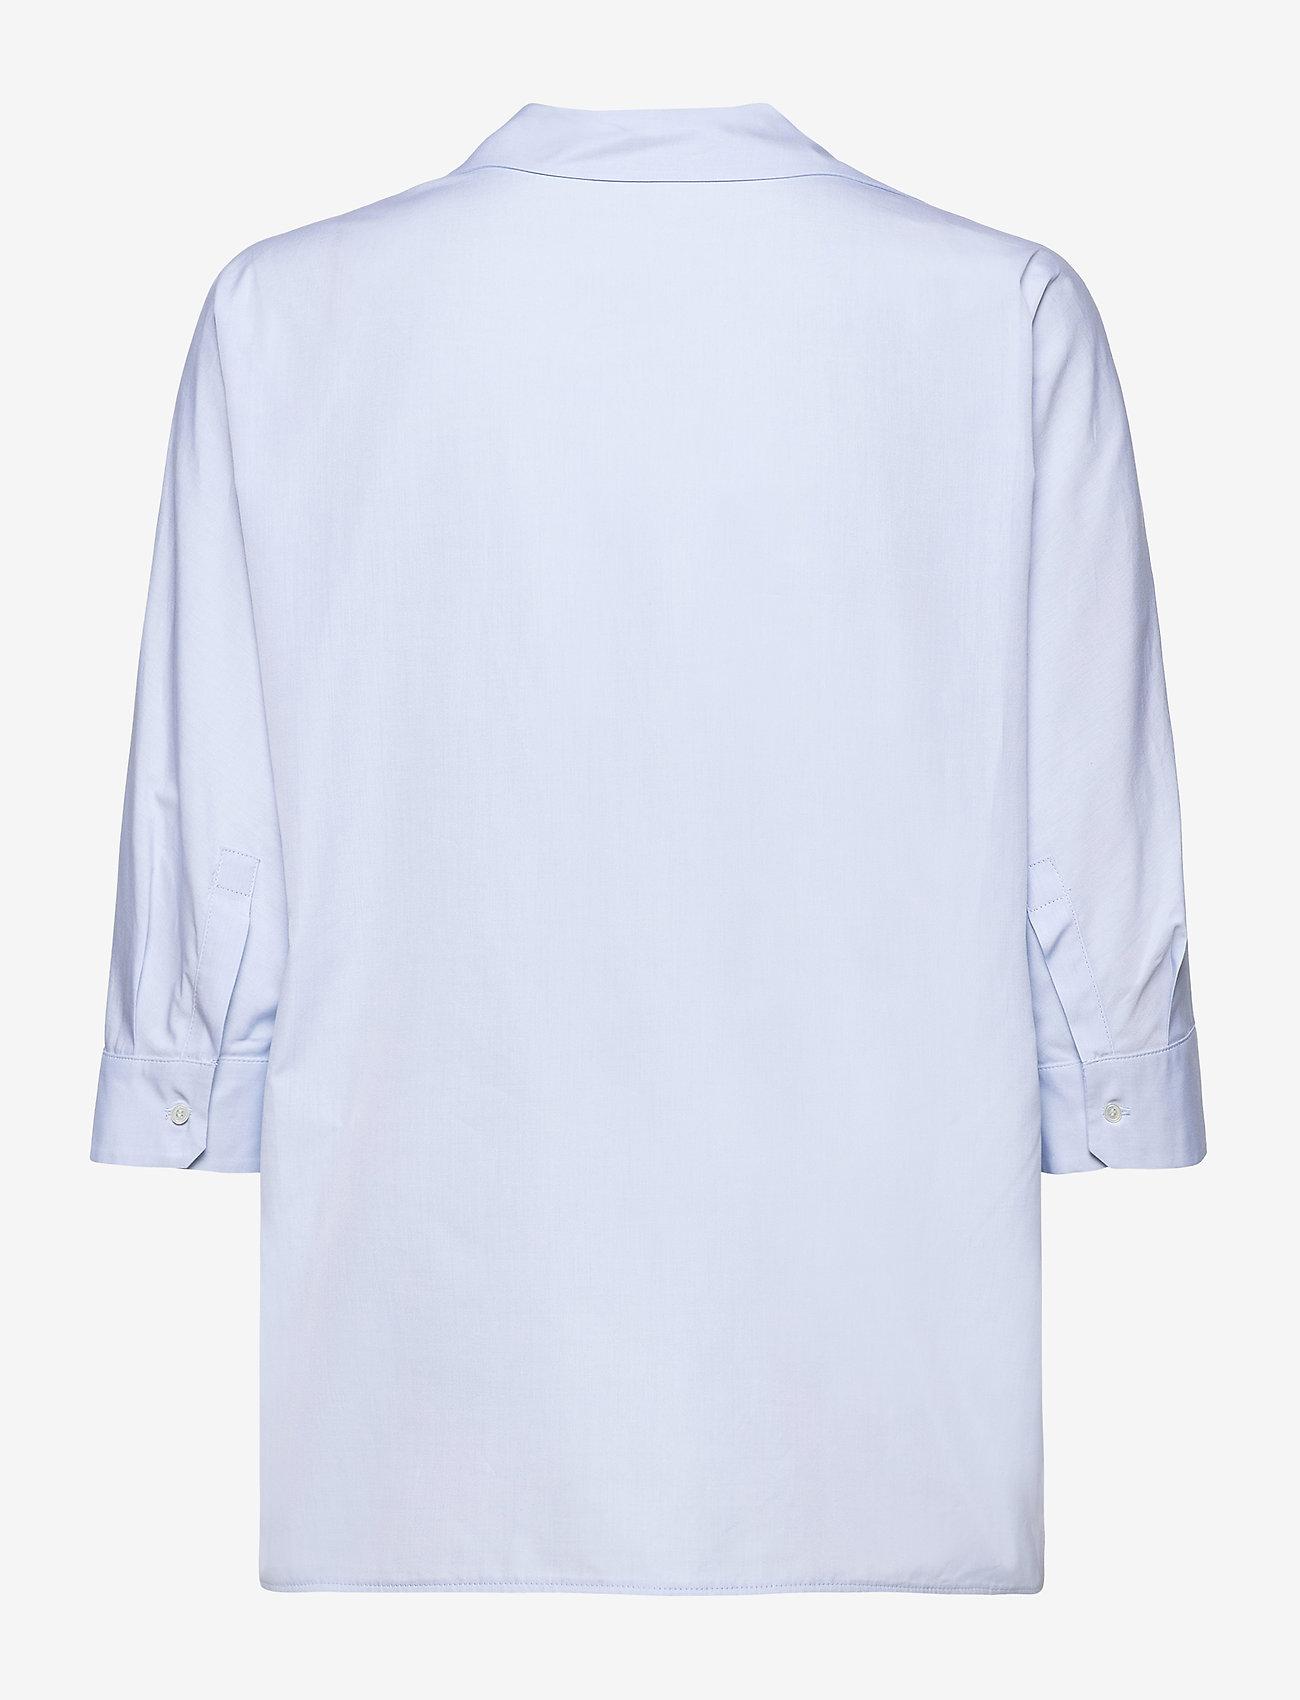 Weekend Max Mara - ERSILIA - chemises à manches longues - light blue - 1